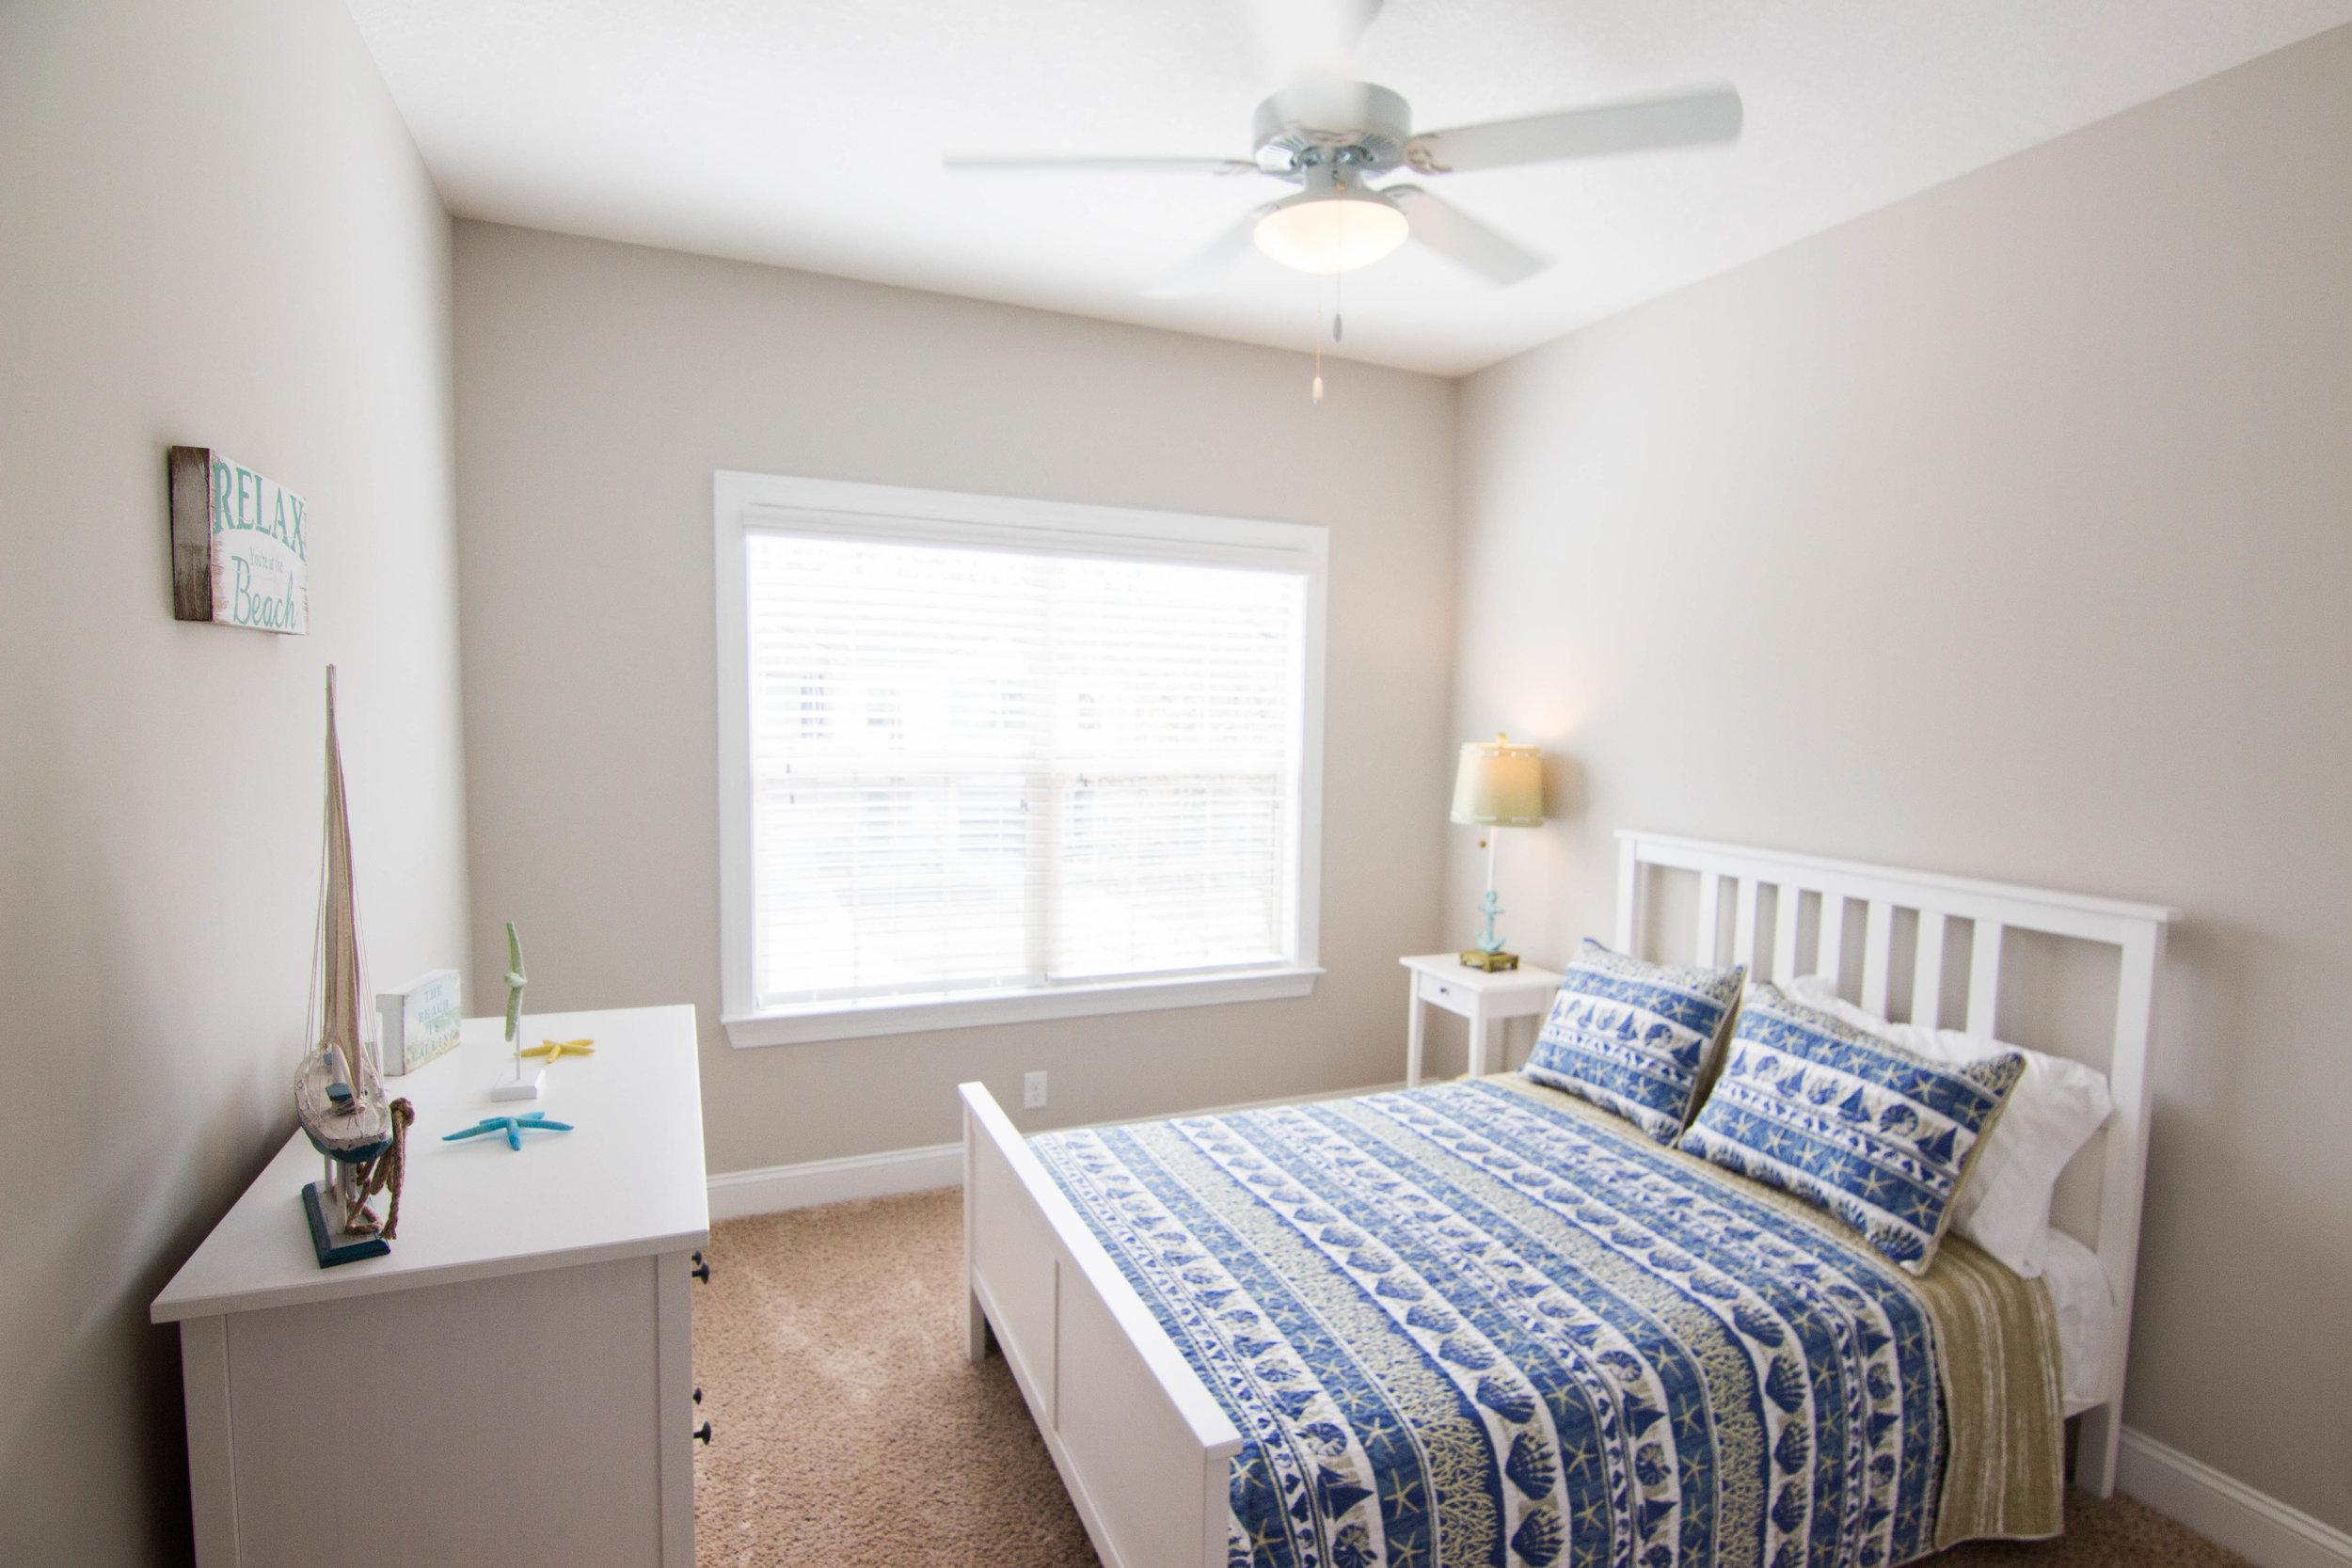 26 Bedroom.jpg